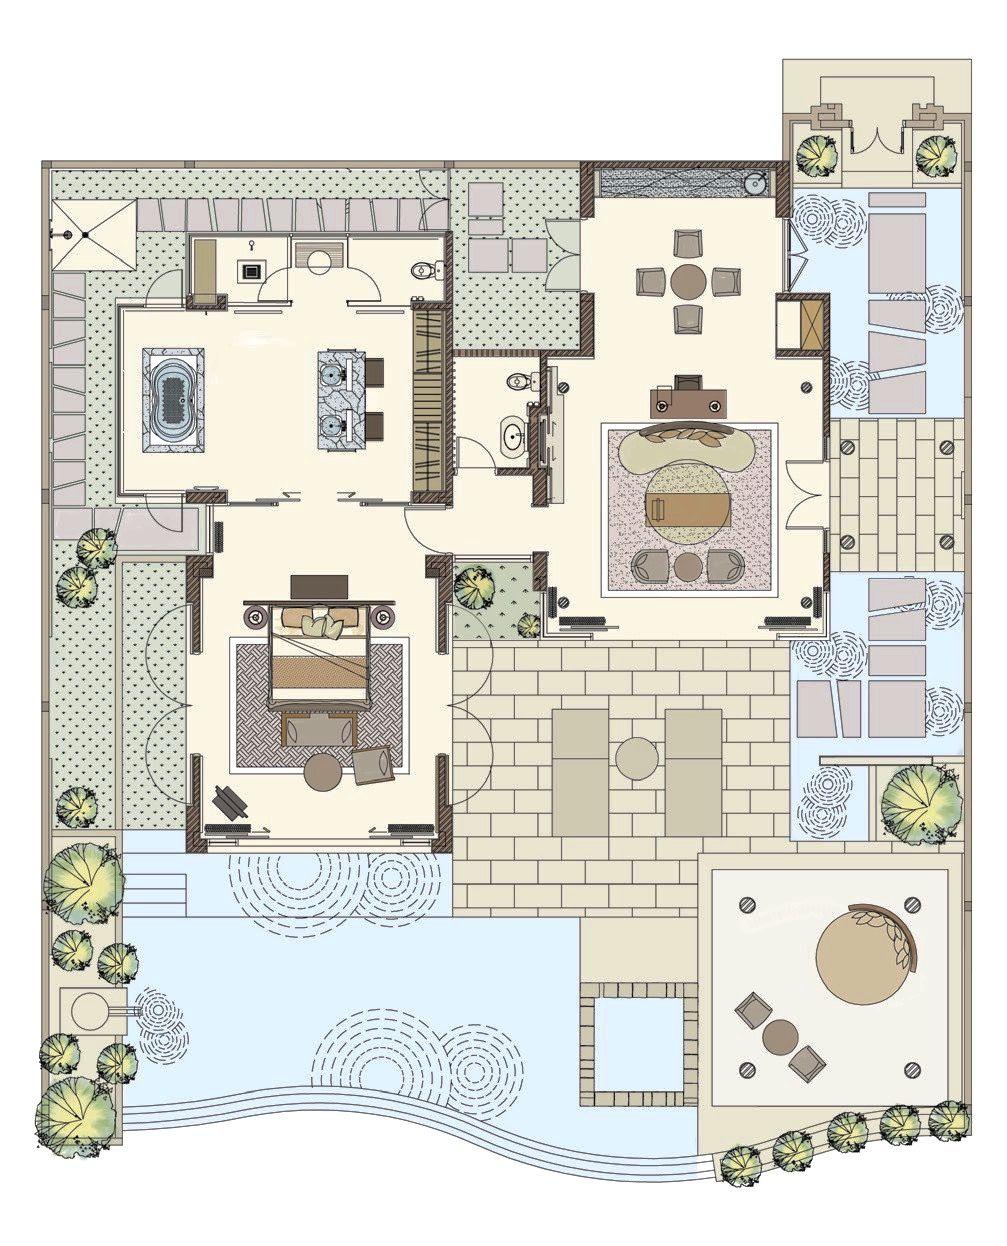 Banyan Tree Residences Ungasan Bali The Villas 1 Land Area 403 Sqm Built Up Area 239 Sqm